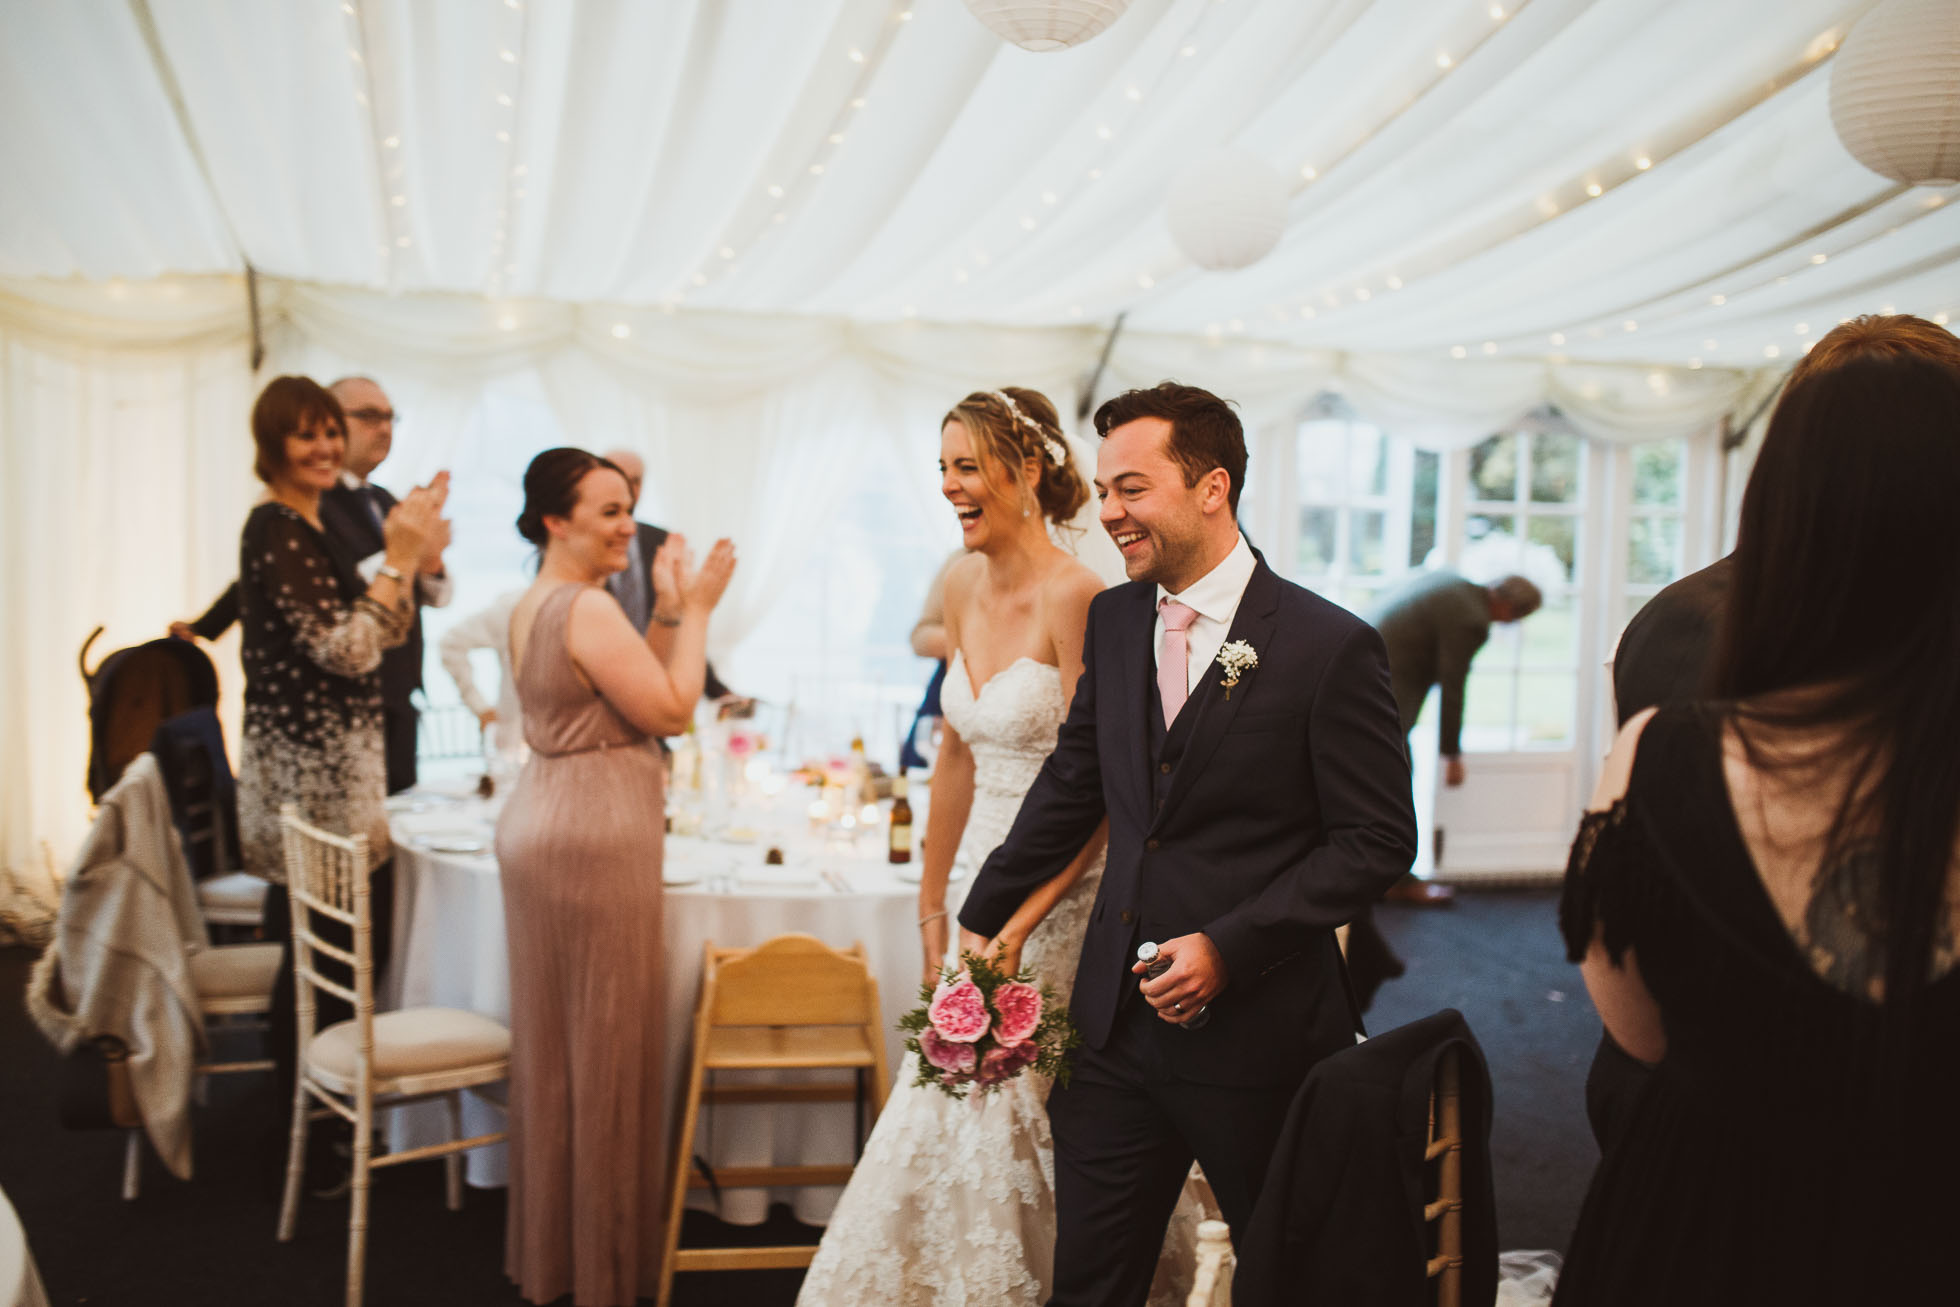 hilltop country house wedding photographer-70.jpg